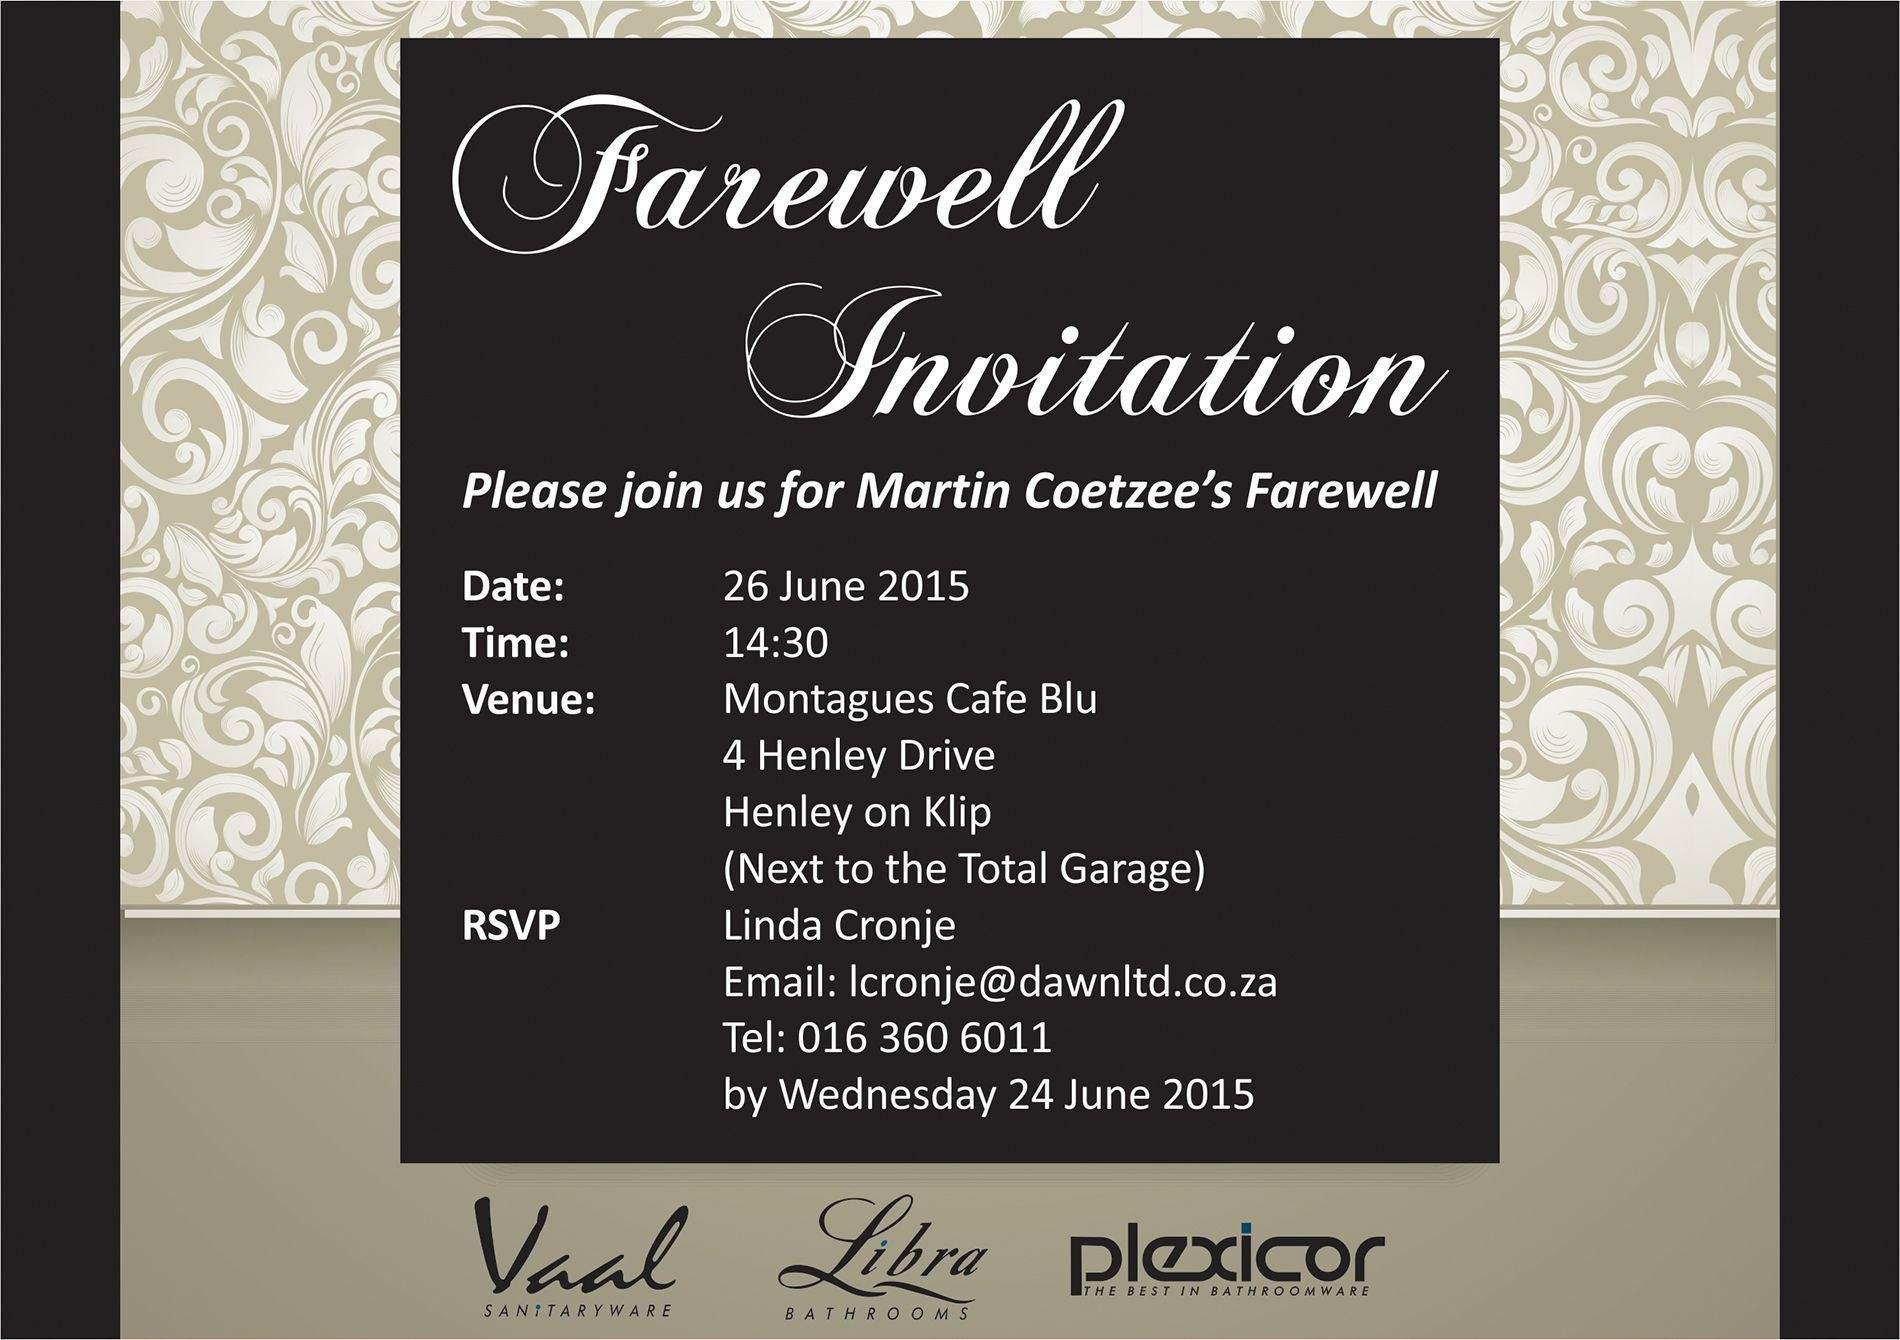 Invitation Event Card  Invitationwwwlolsurprisedollinvitations With Regard To Event Invitation Card Template